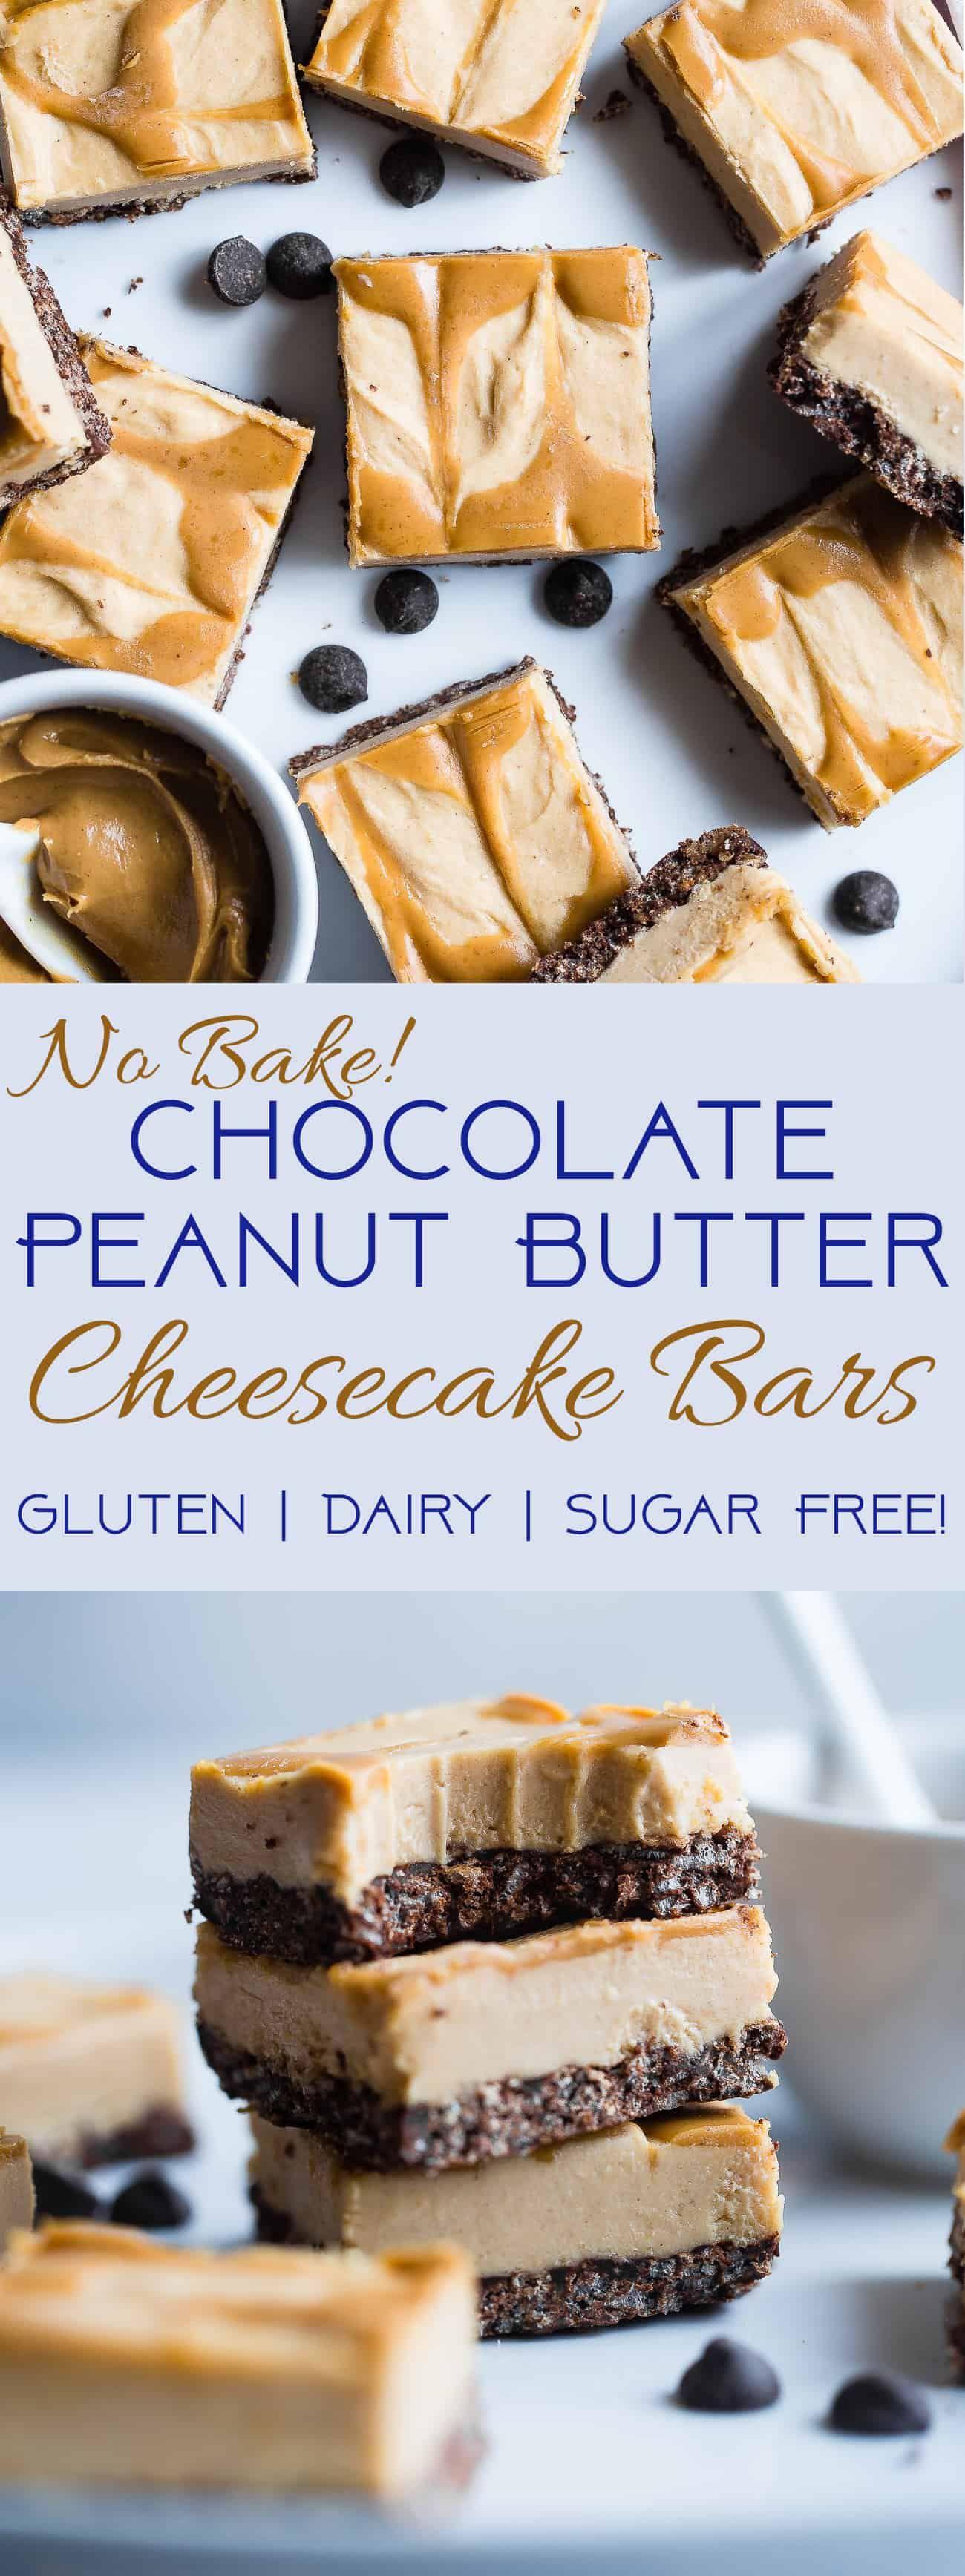 Dairy and gluten free no bake peanut butter cheesecake